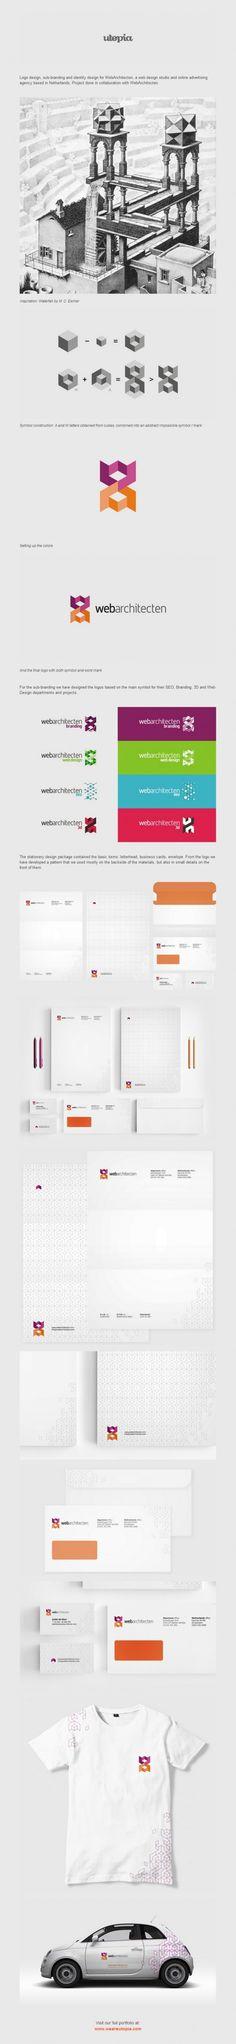 Web Architecten logo and corporate identity design by Utopia Branding Agency